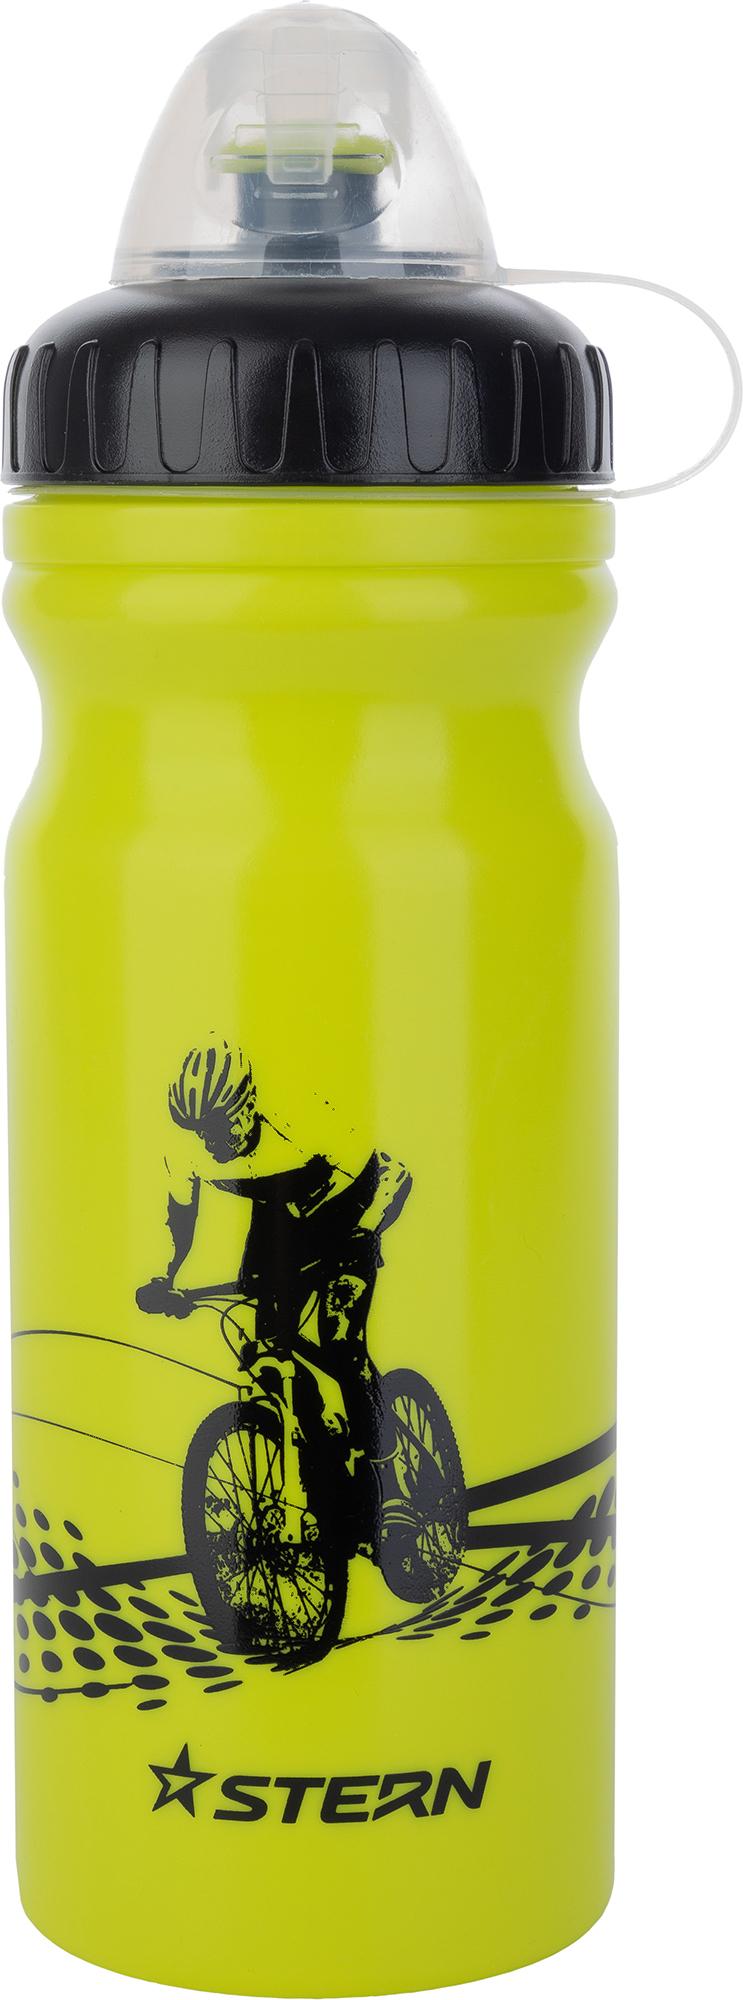 Stern Фляжка велосипедная Stern цена